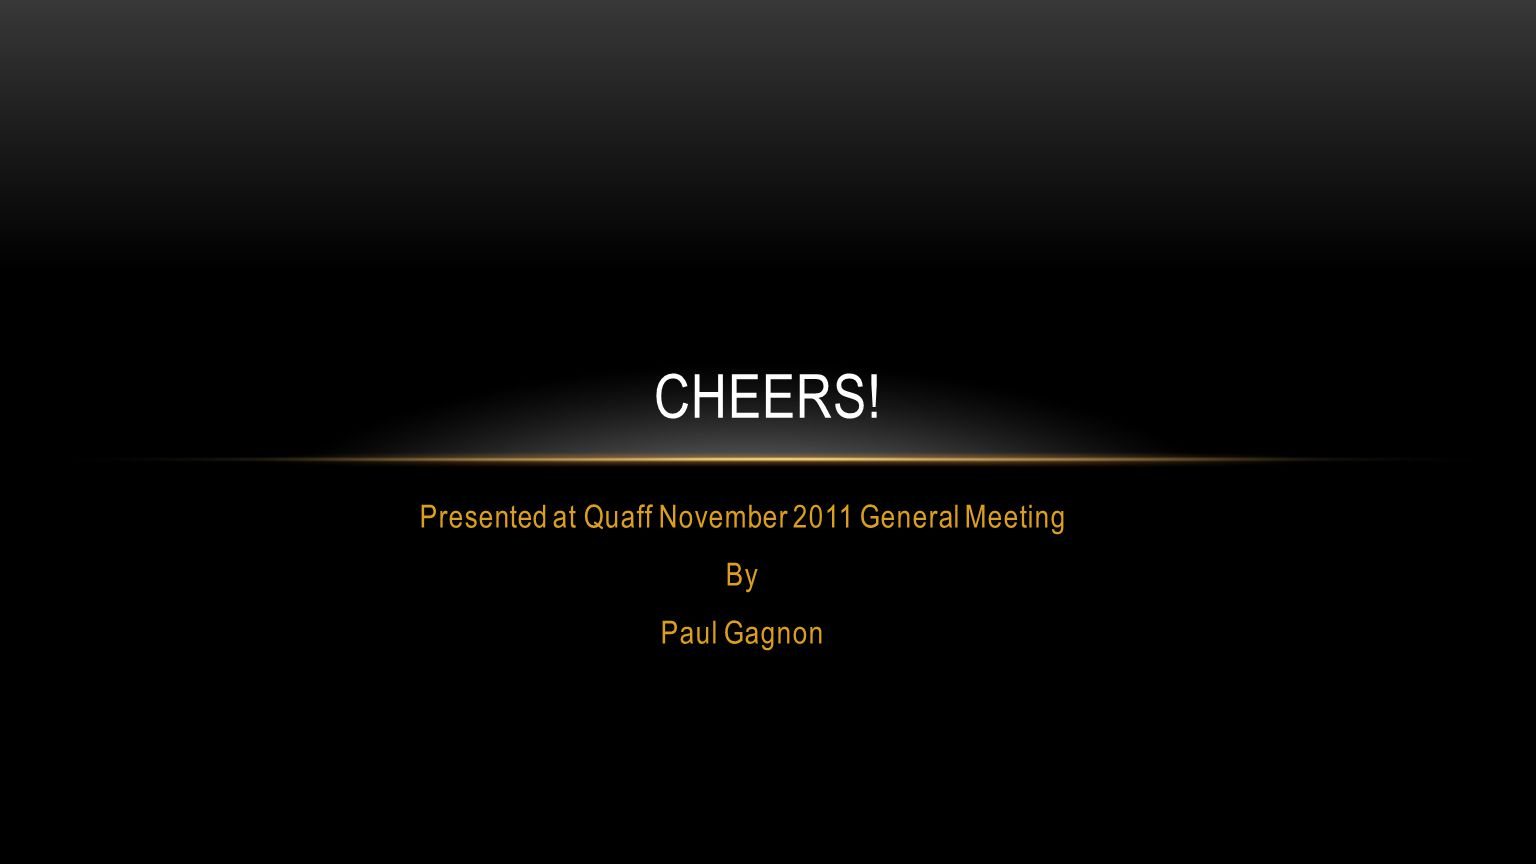 Presented at Quaff November 2011 General Meeting By Paul Gagnon CHEERS!